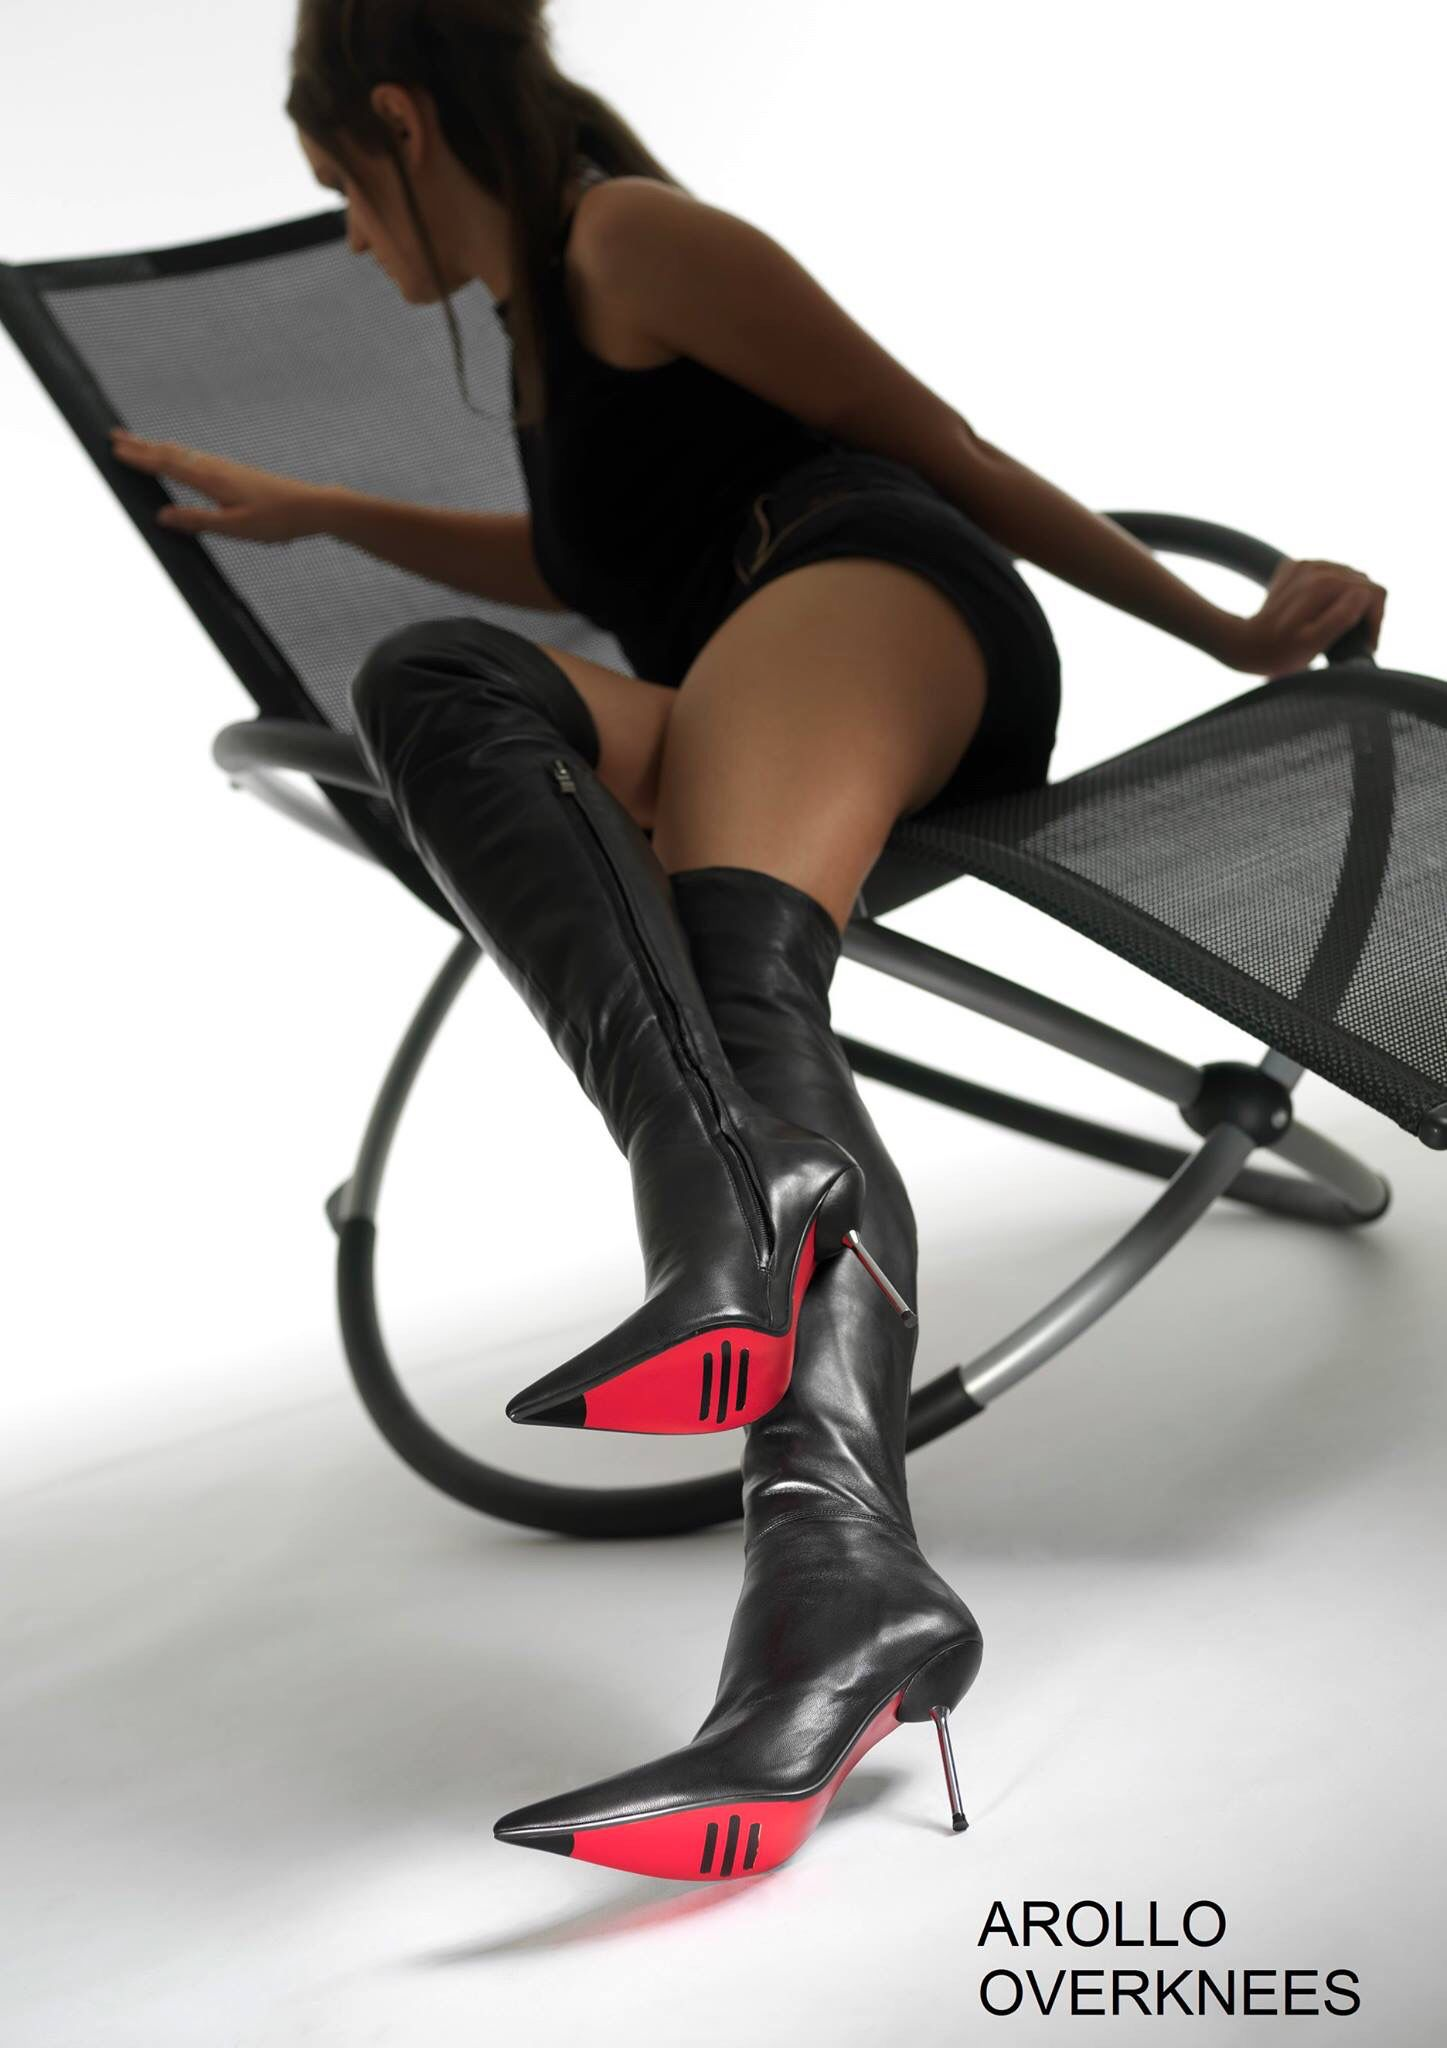 Arollo Leather Heeled Boots 62c0b637b5b3803b0023c0f850e1e06c